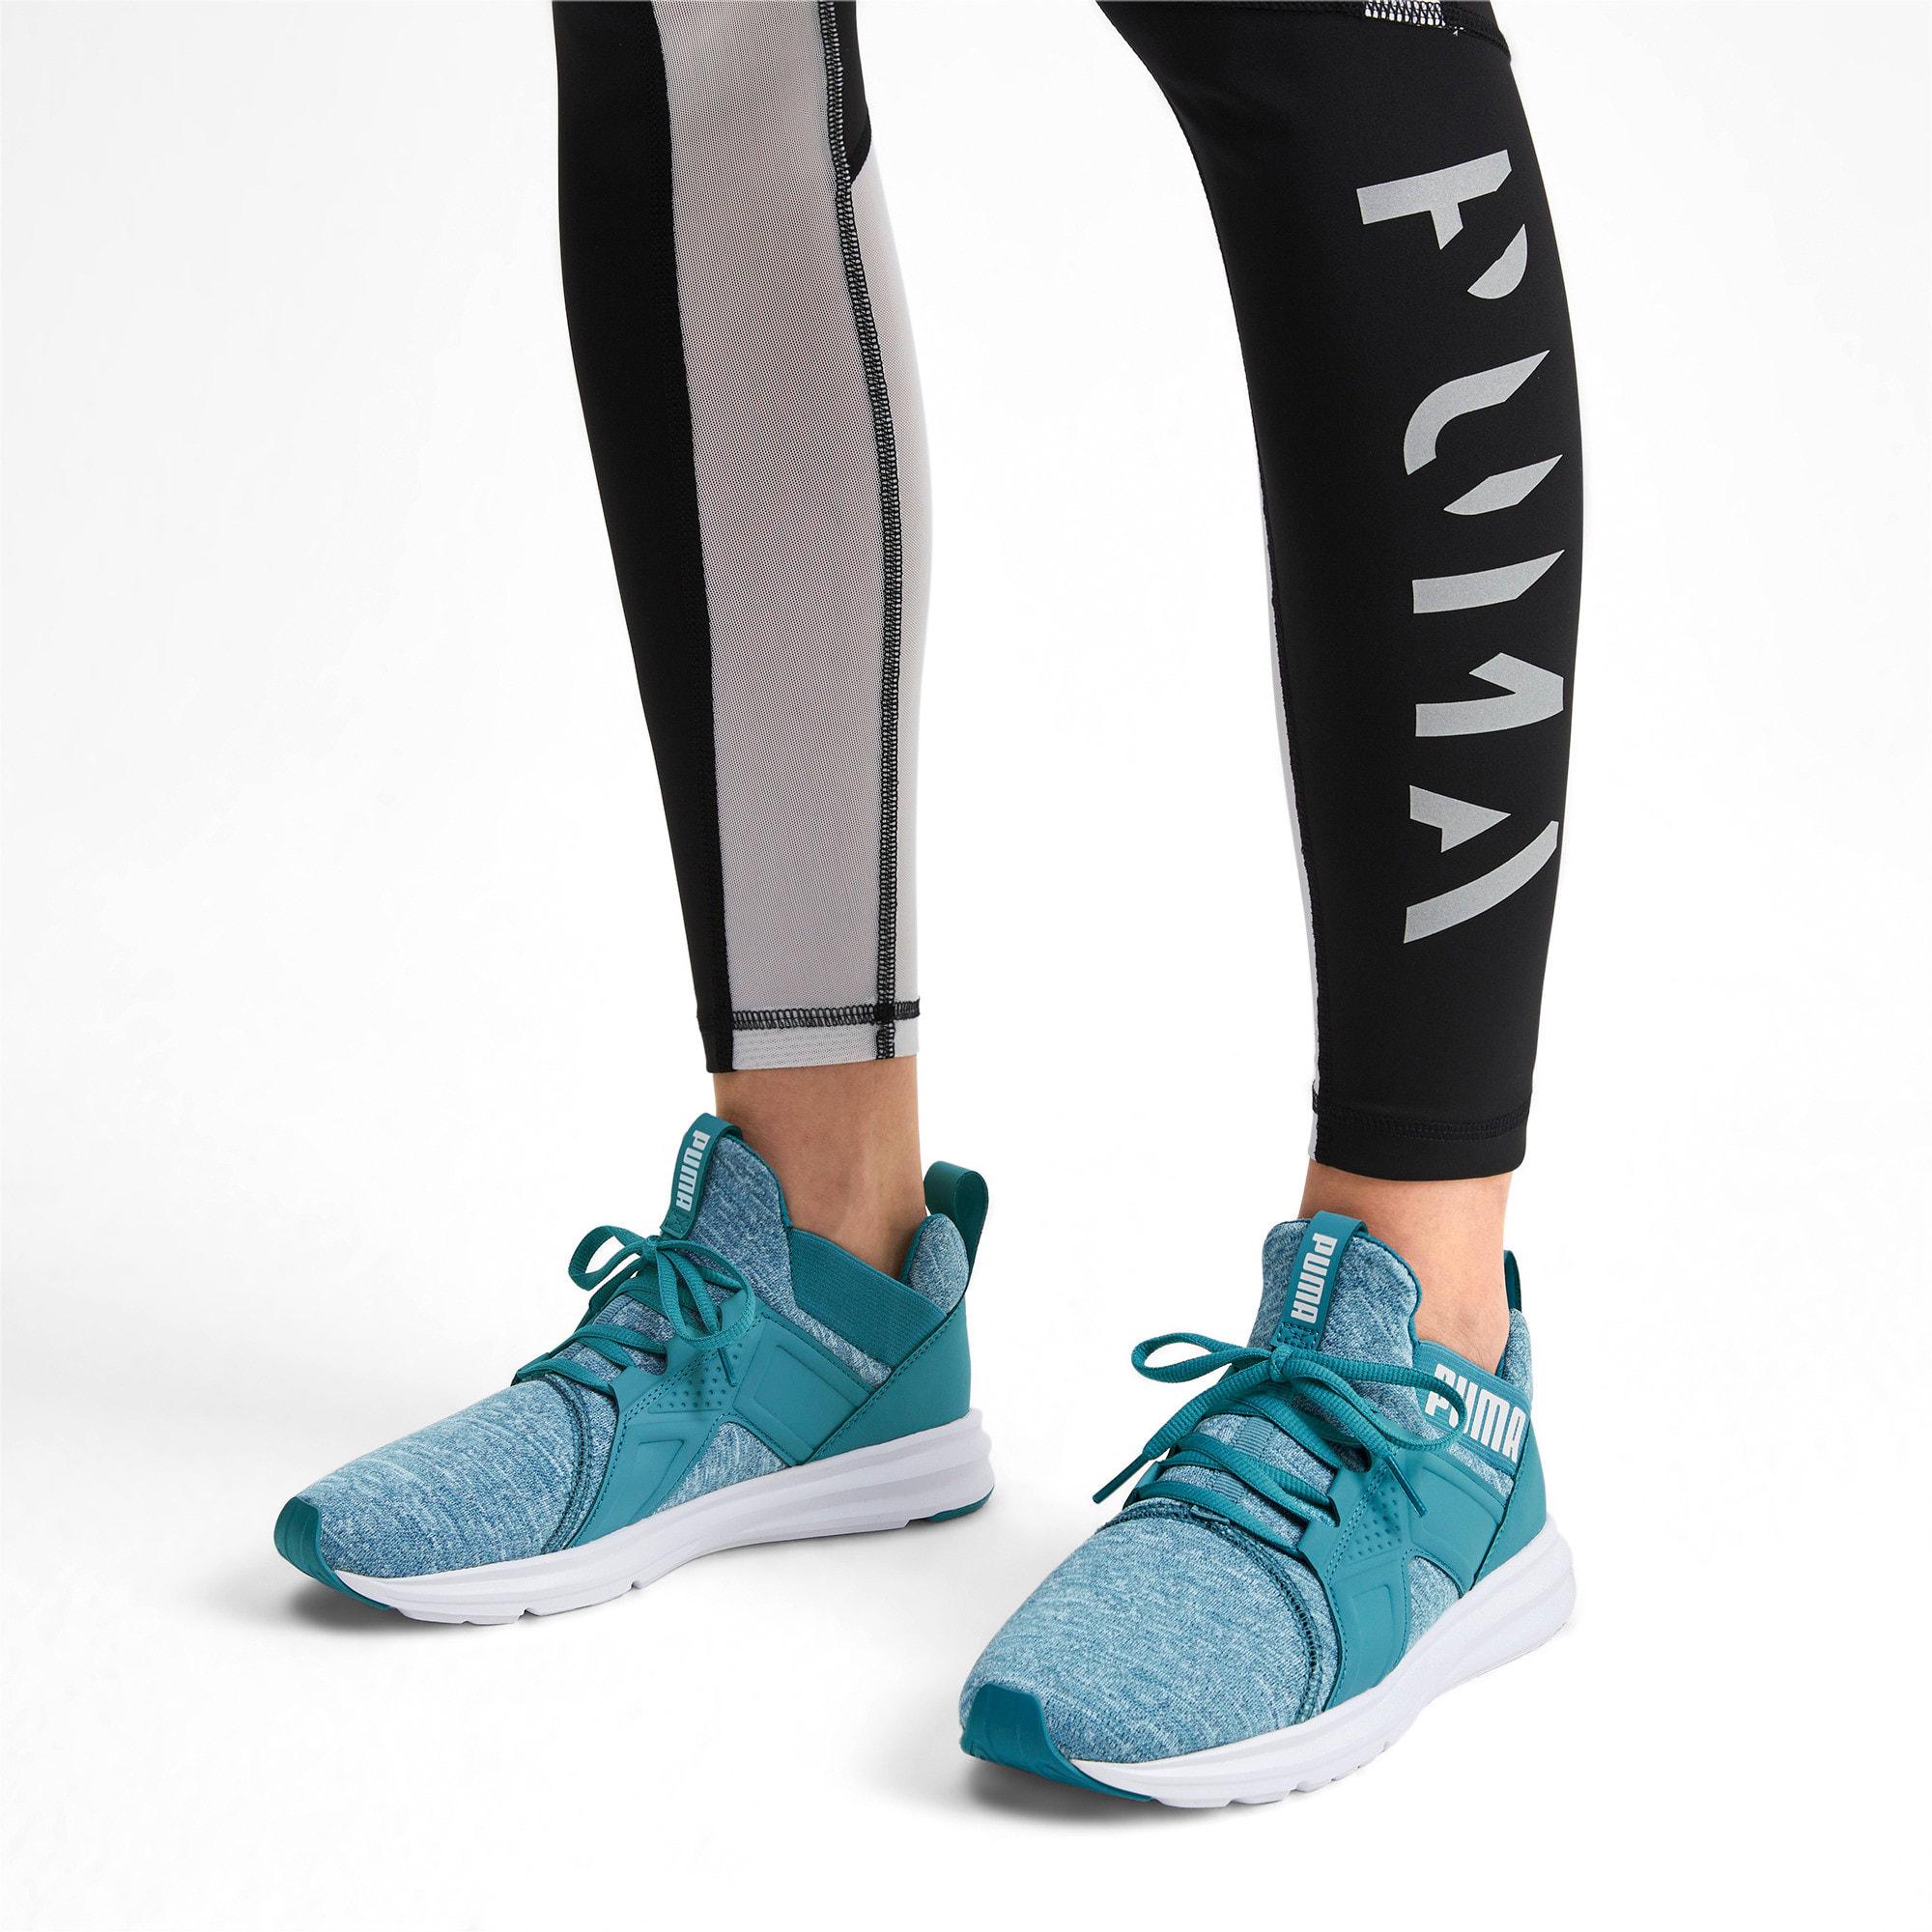 Thumbnail 3 of Enzo Heather Women's Sneakers, Bluestone-Milky Blue-White, medium